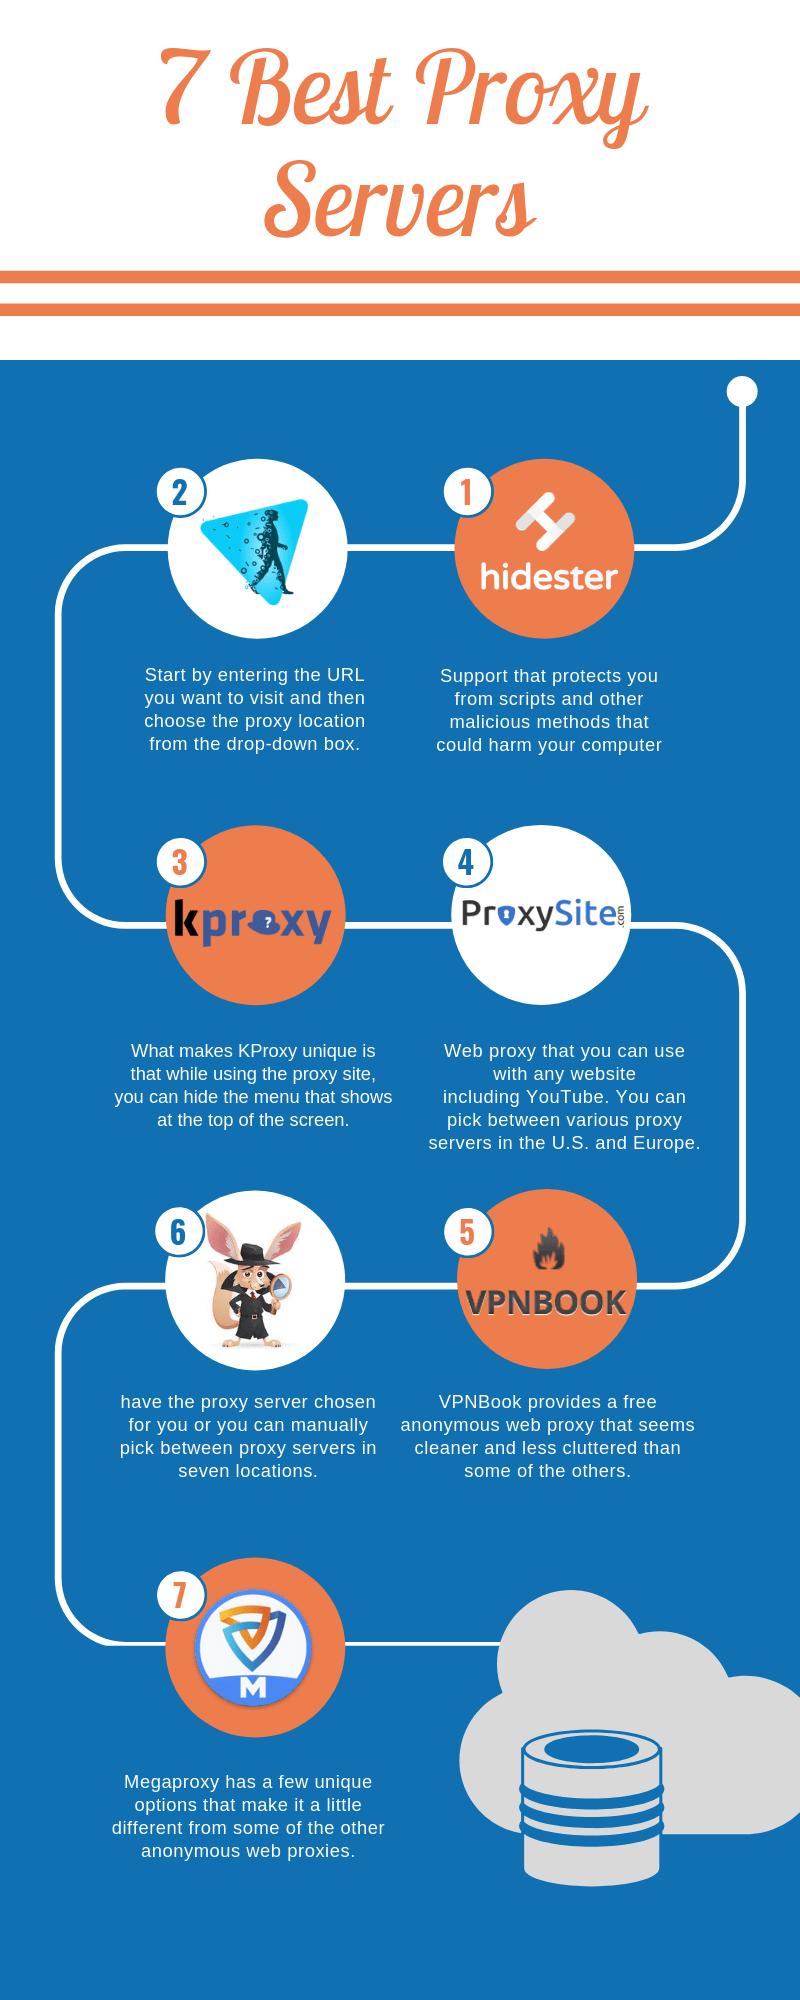 7 Best Proxy Servers